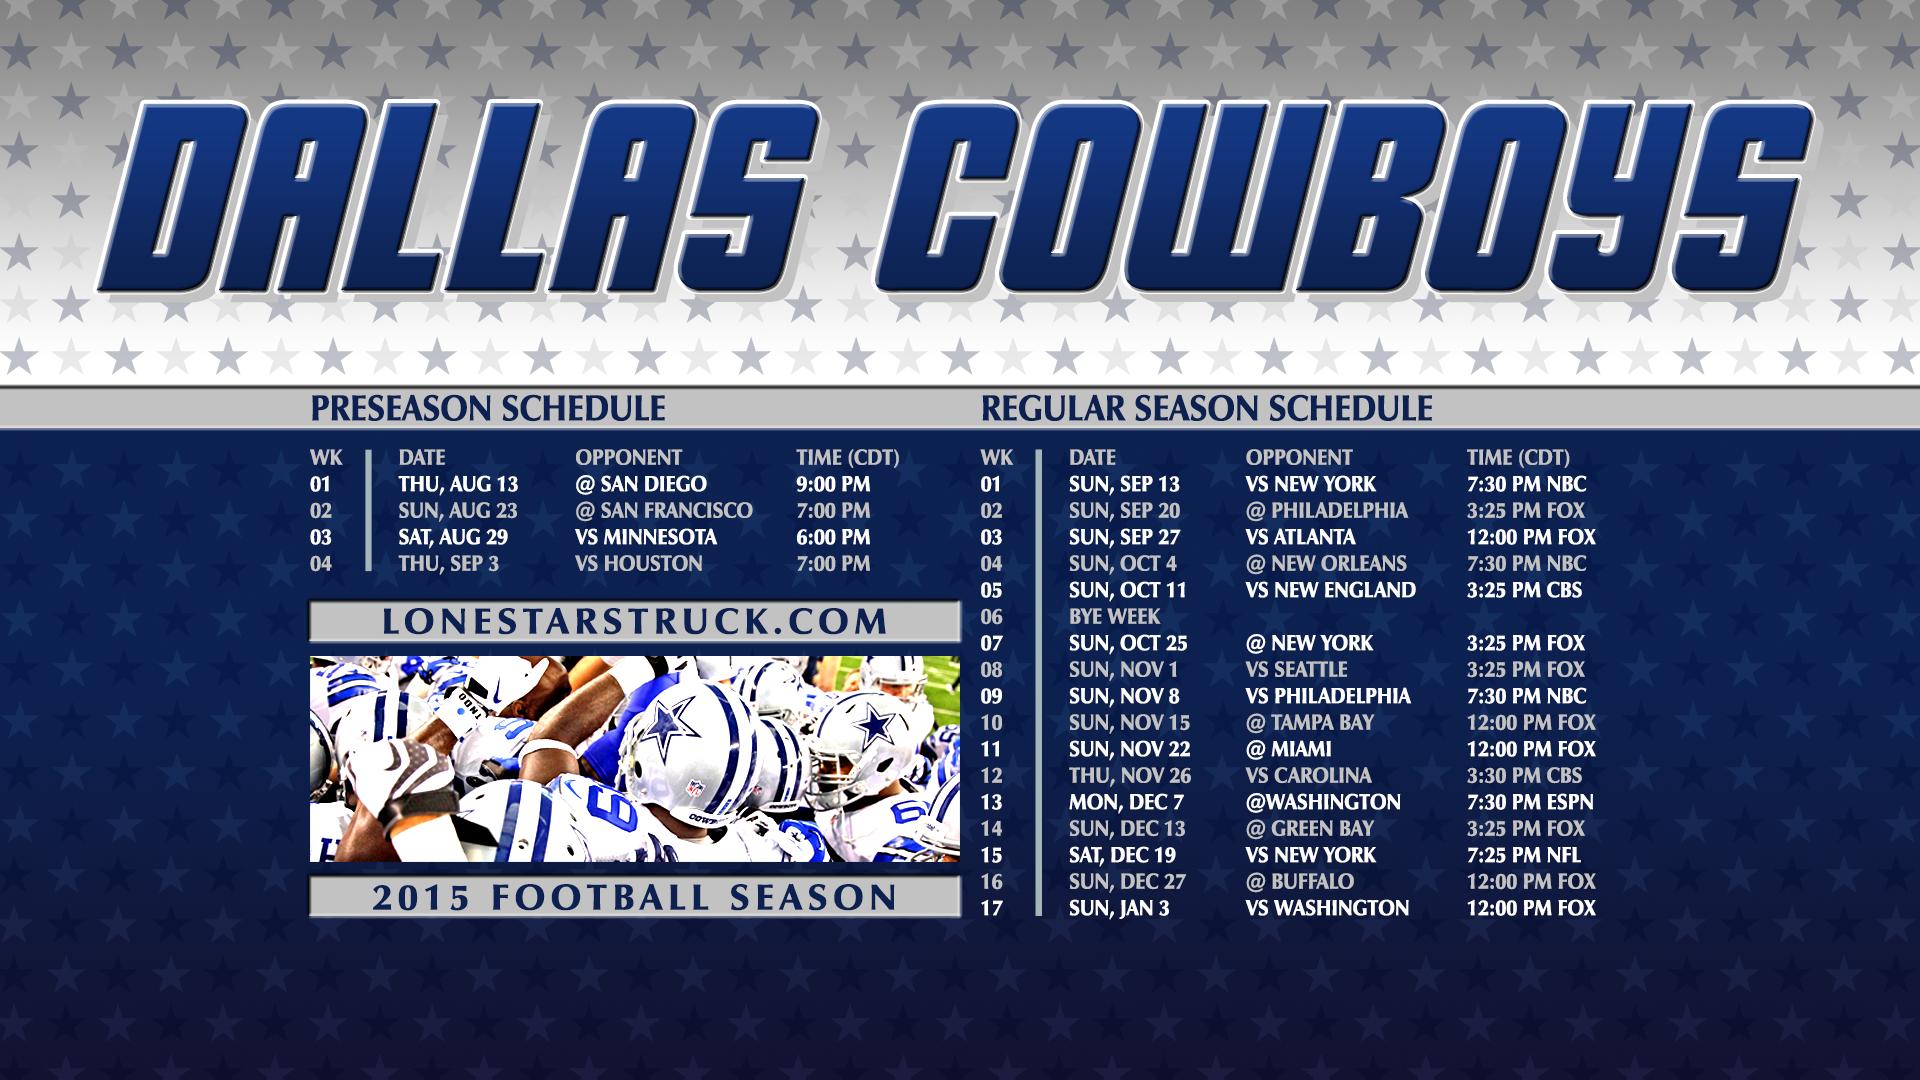 2015 NFL Schedule Dallas Cowboys Wallpaper 1920x1080